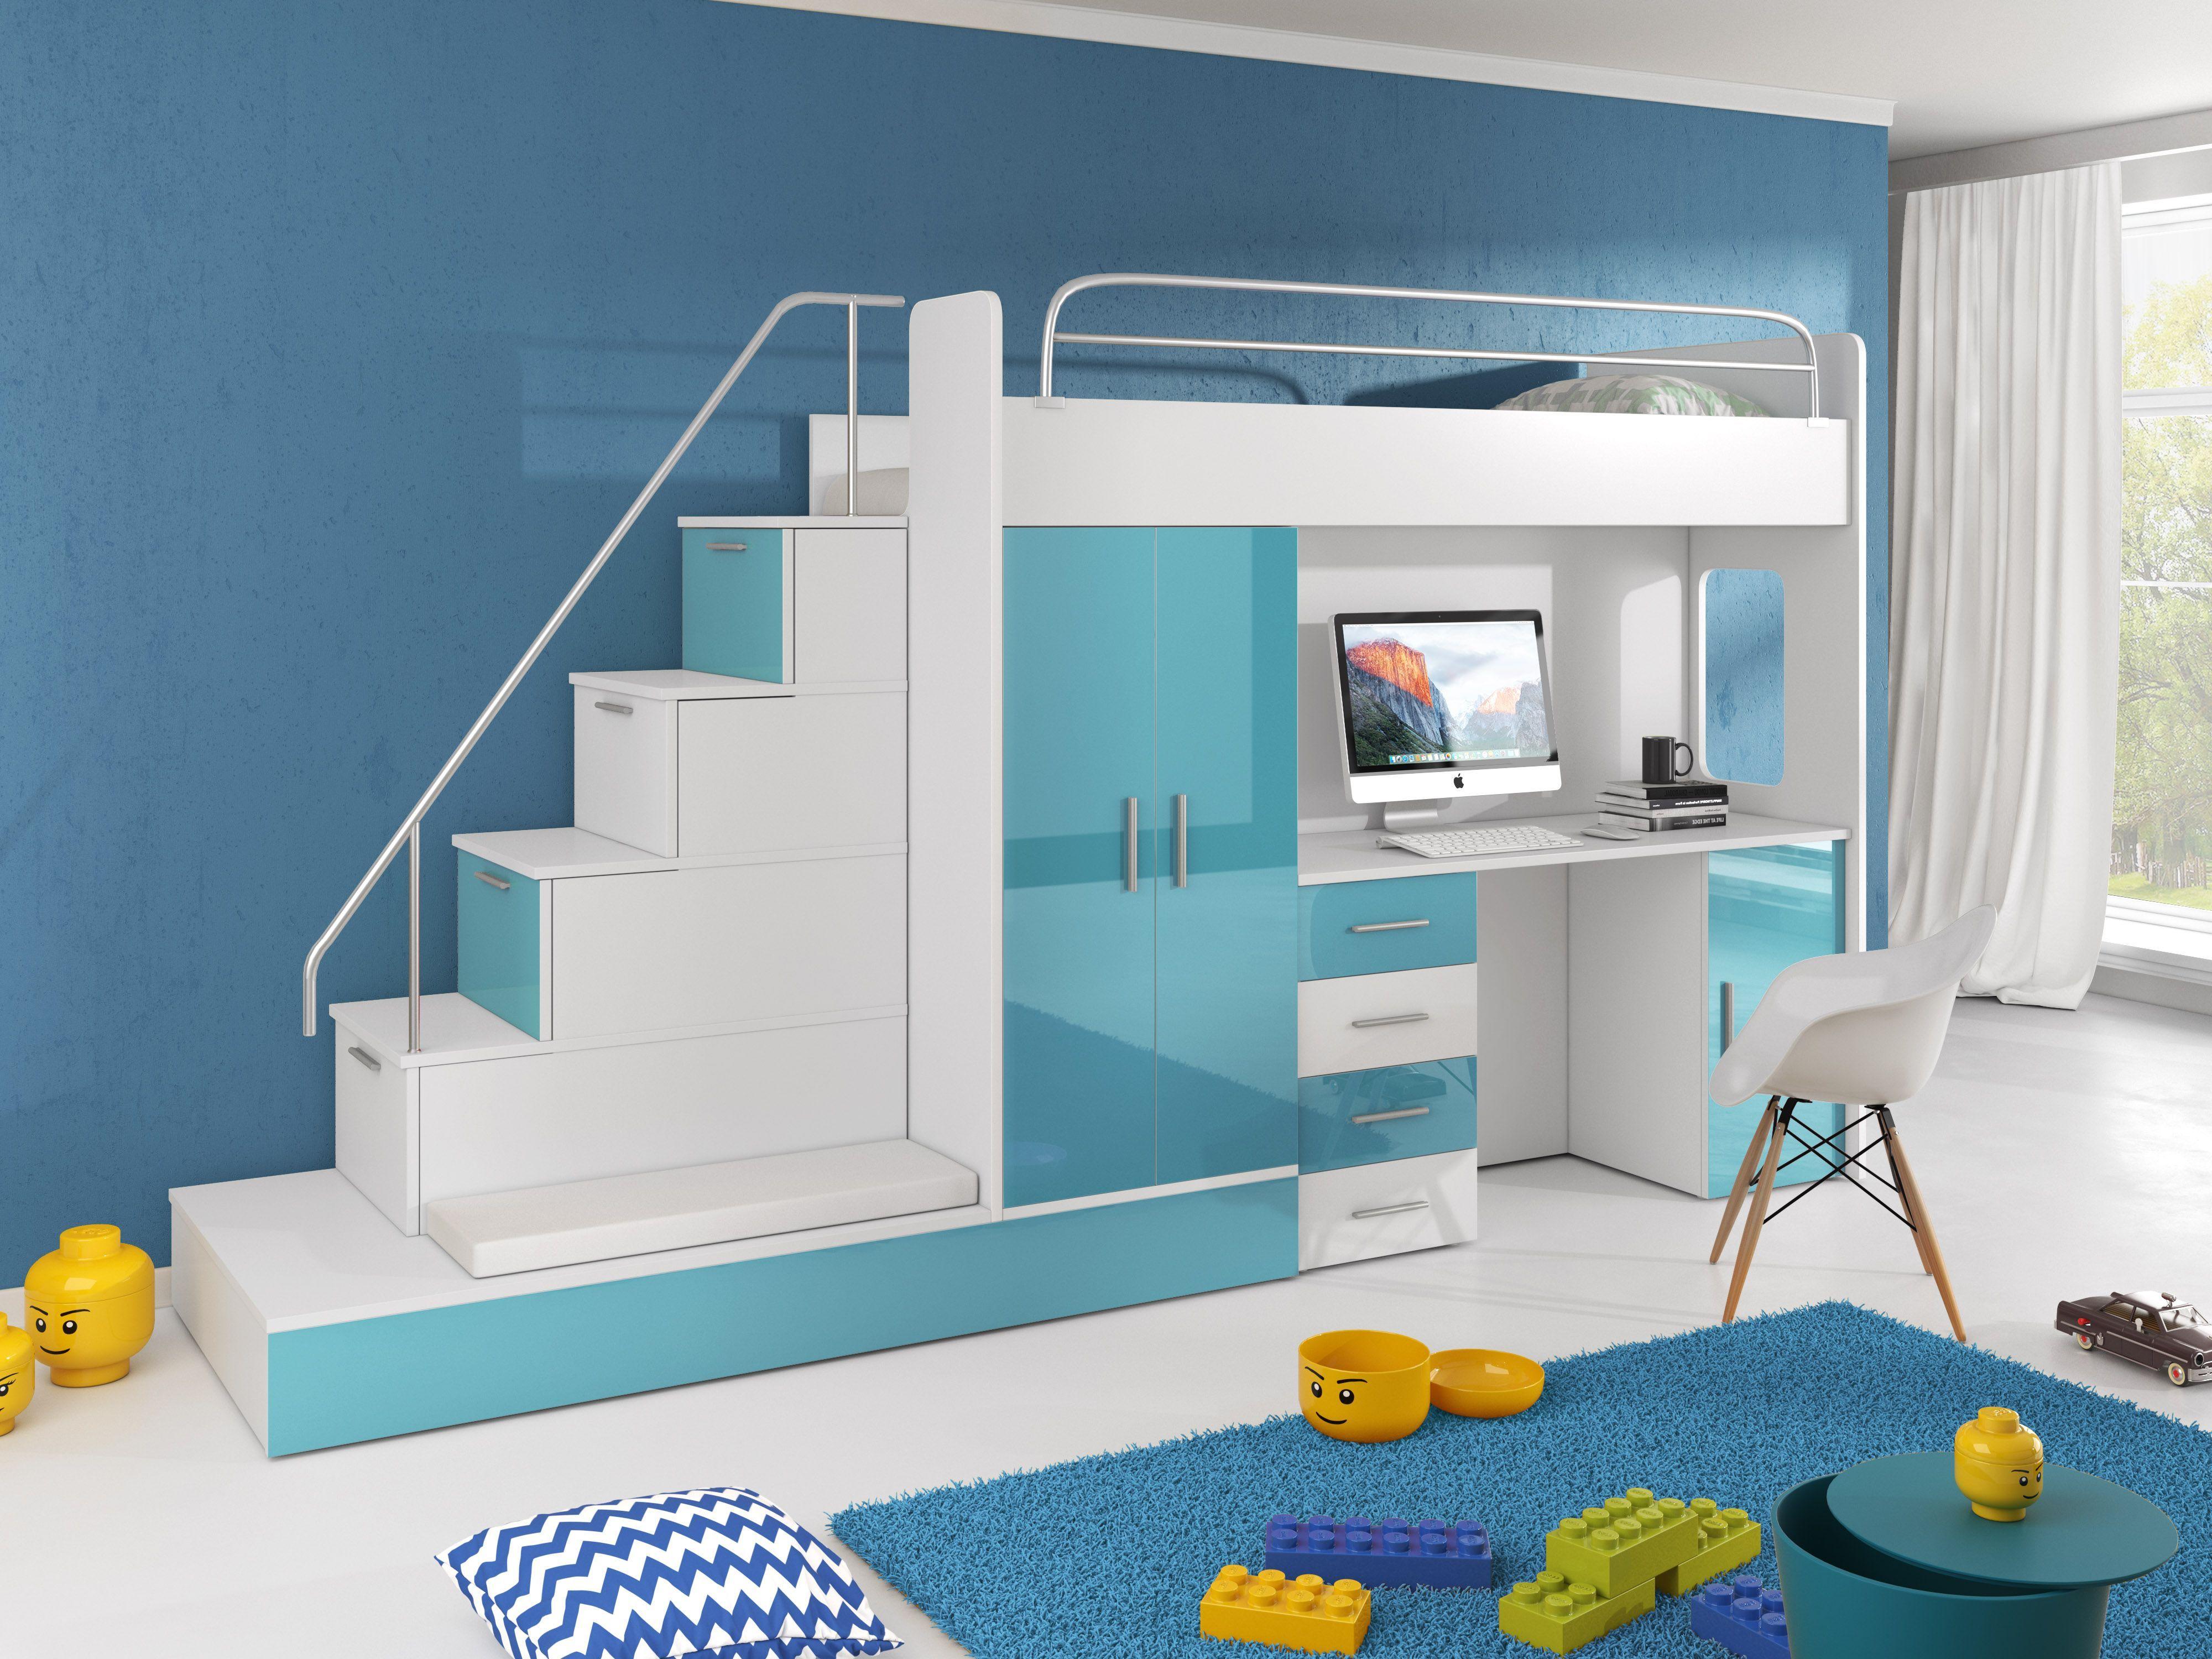 Paradise Hochbett 5 Azurblau 80x200cm Schlafzimmer Set